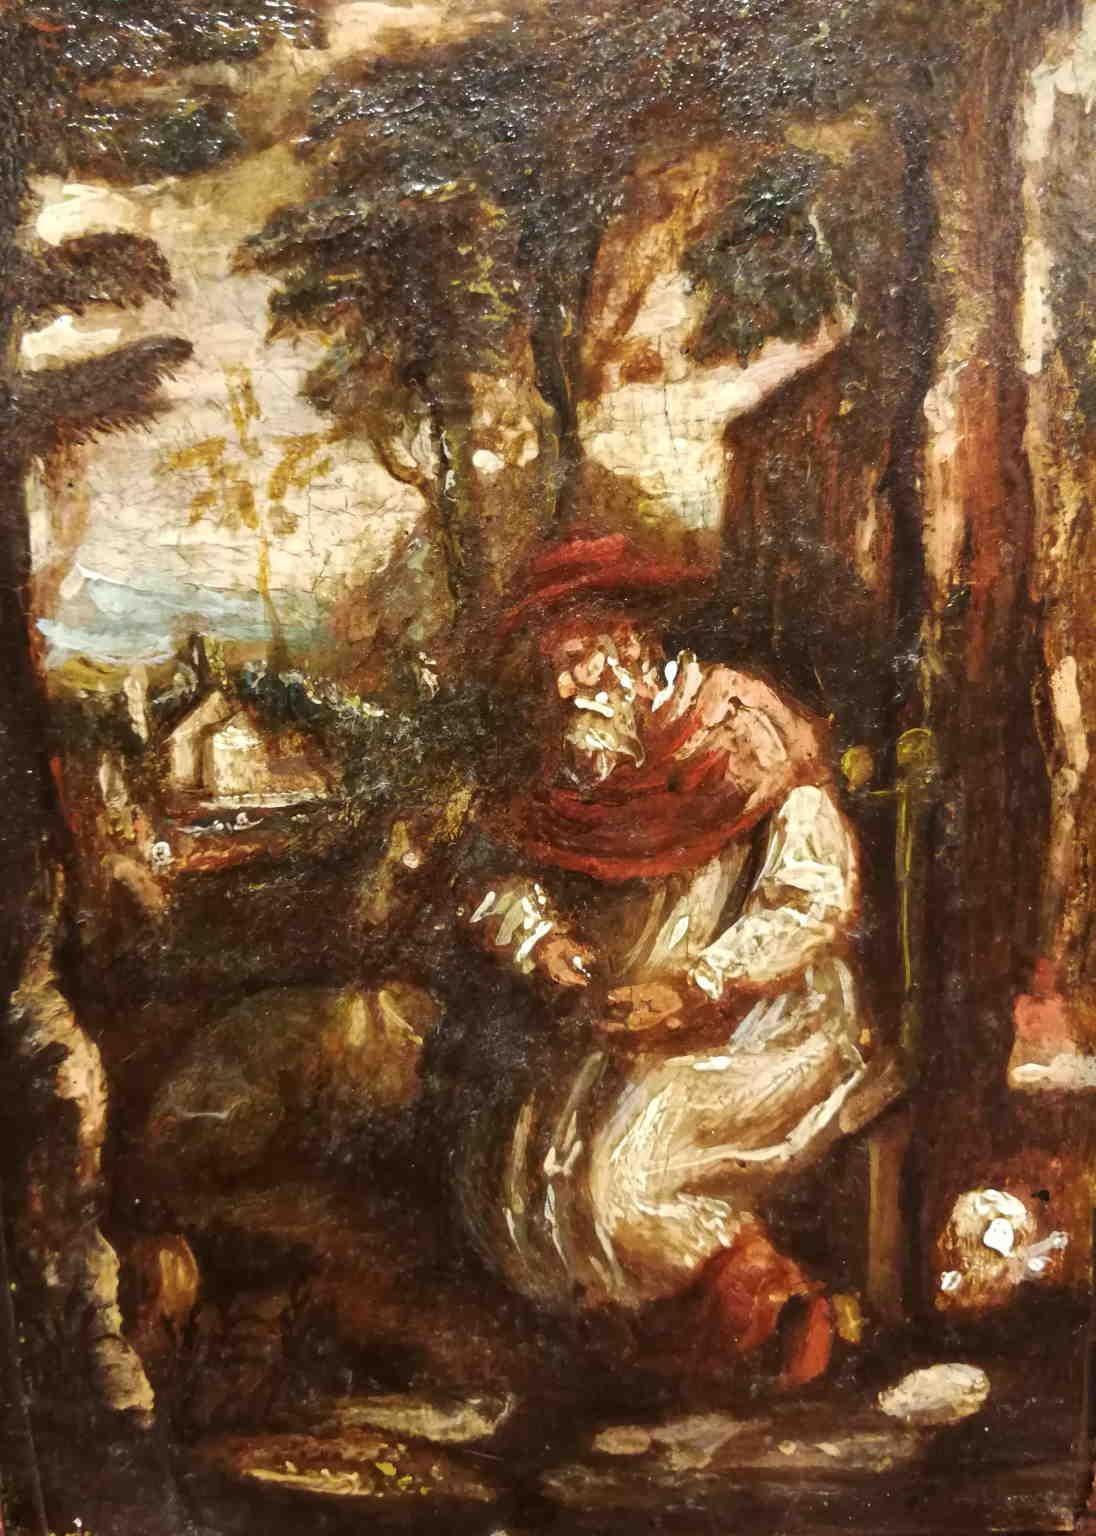 Veneto Baroque Religious Painting 17 century oil paper wood